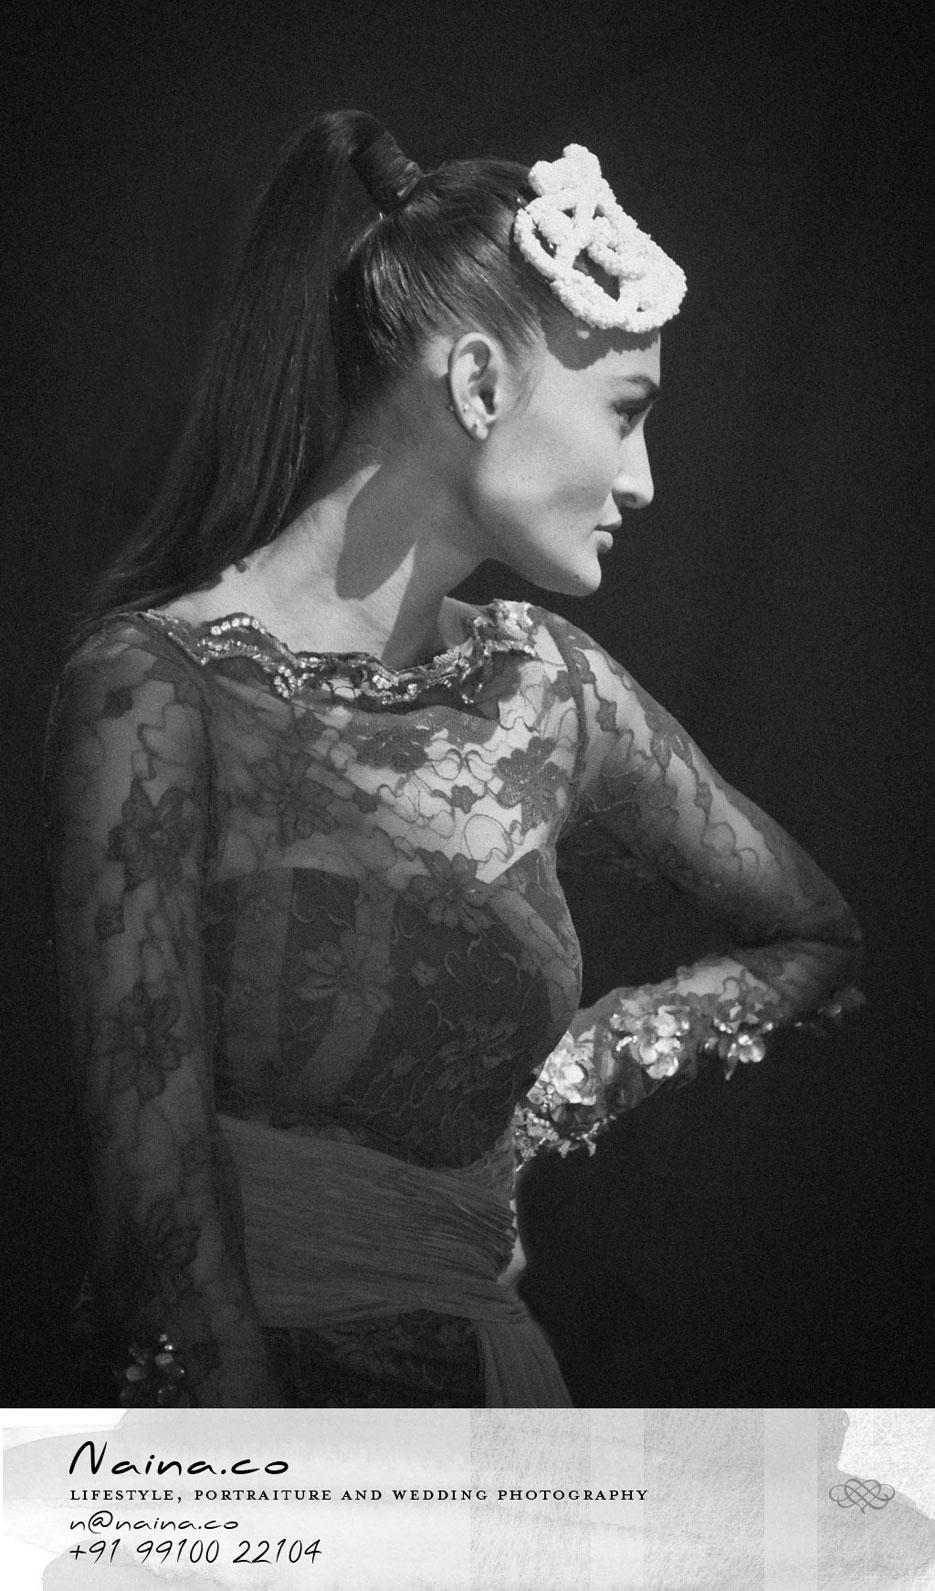 Portraits of an Indian fashion model Rachel Bayros. Photography by professional Indian fashion photographer Naina Redhu of Naina.co